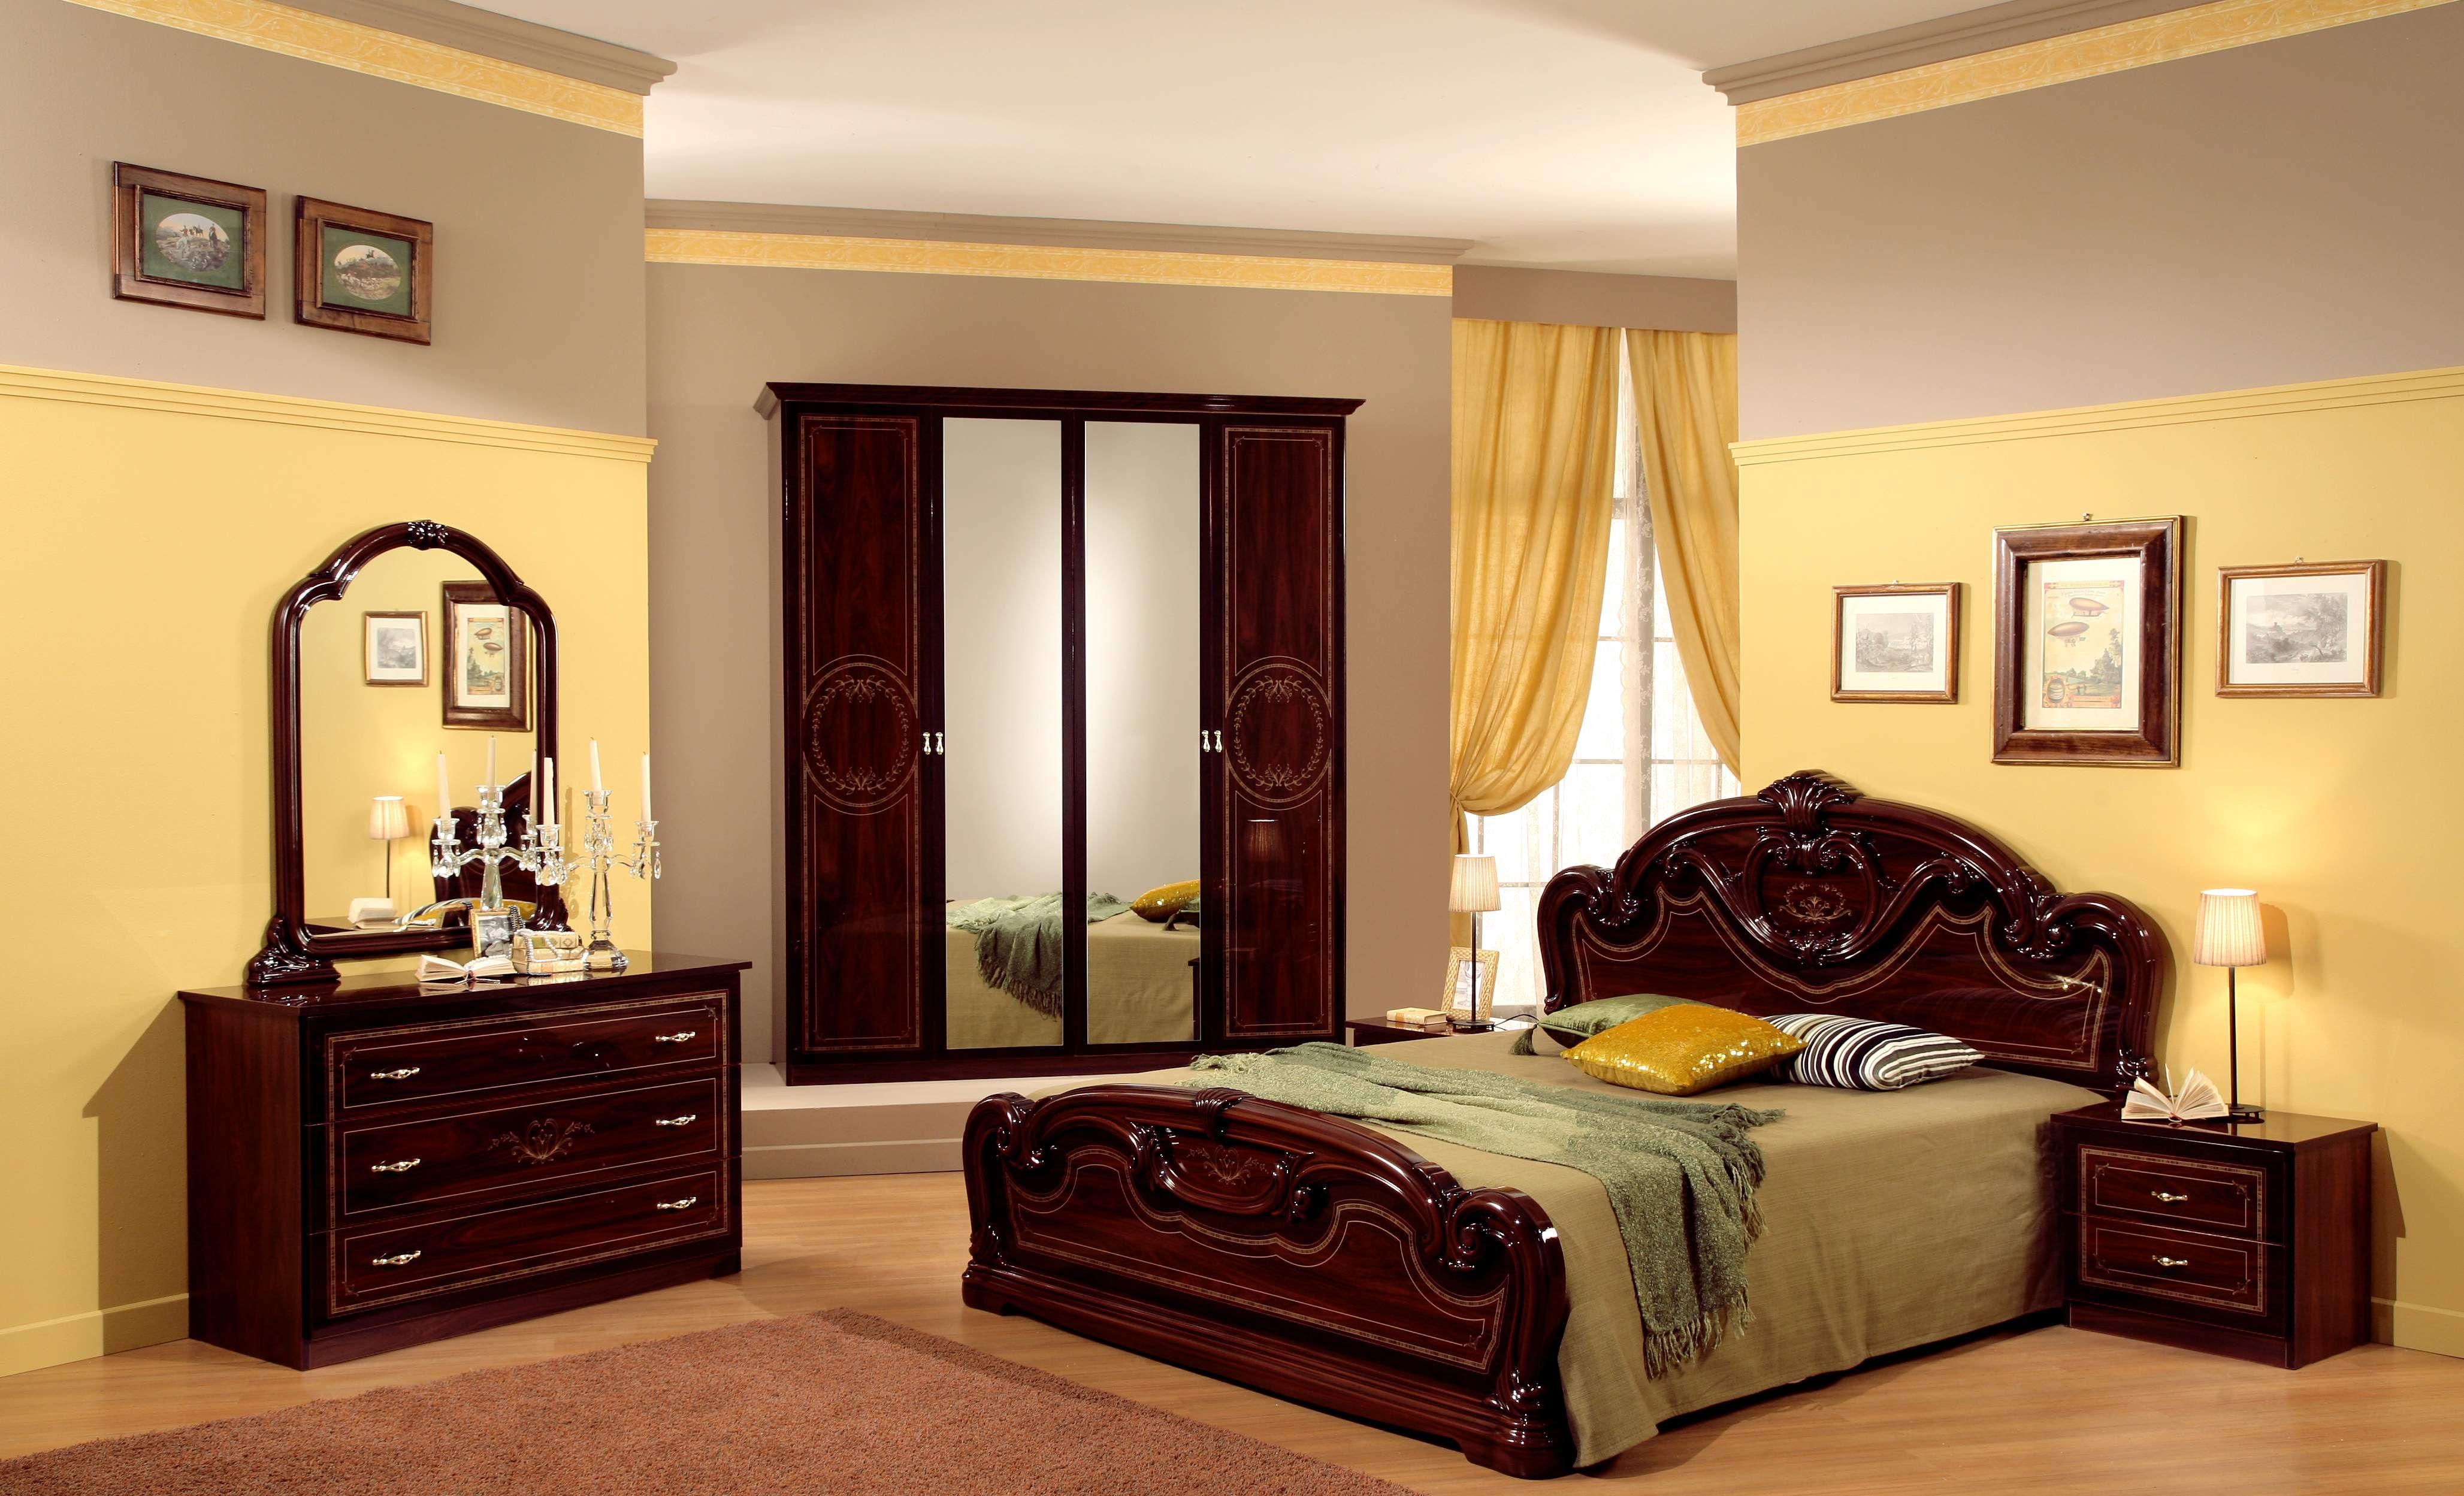 Classic Bedroom Design Decor Furniture Ideas Cream Yellow Color